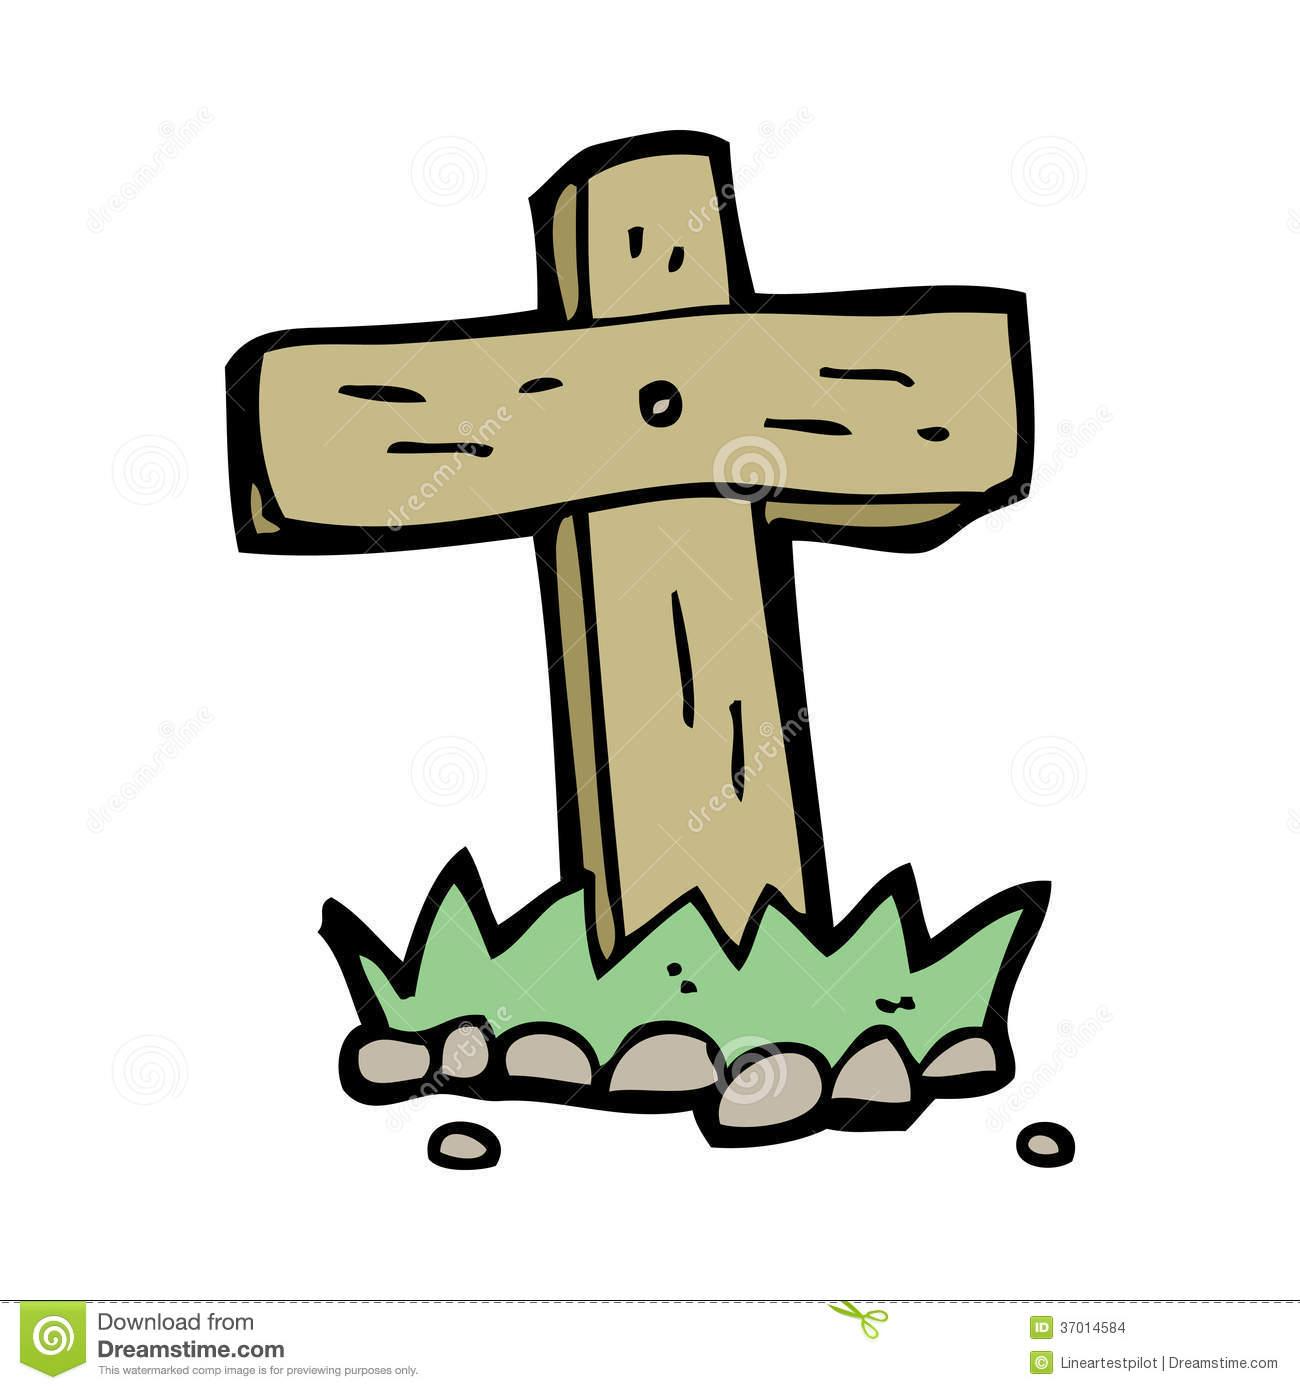 Cartoon wooden cross grave stock vector. Illustration of clip.